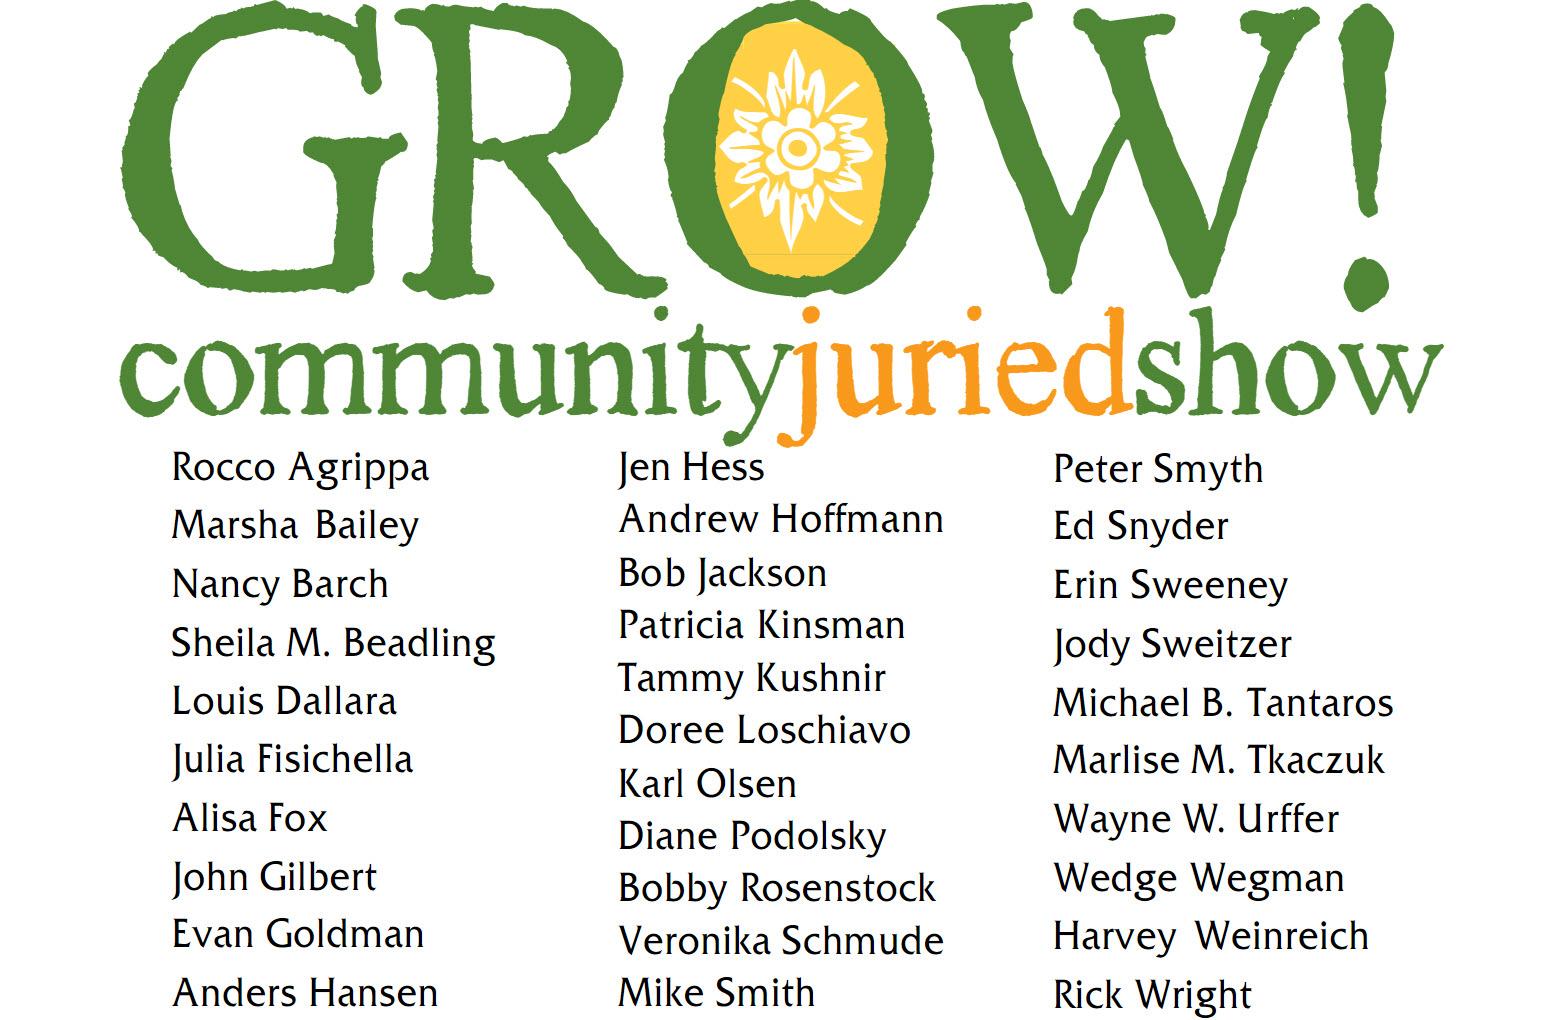 grow-show-2009